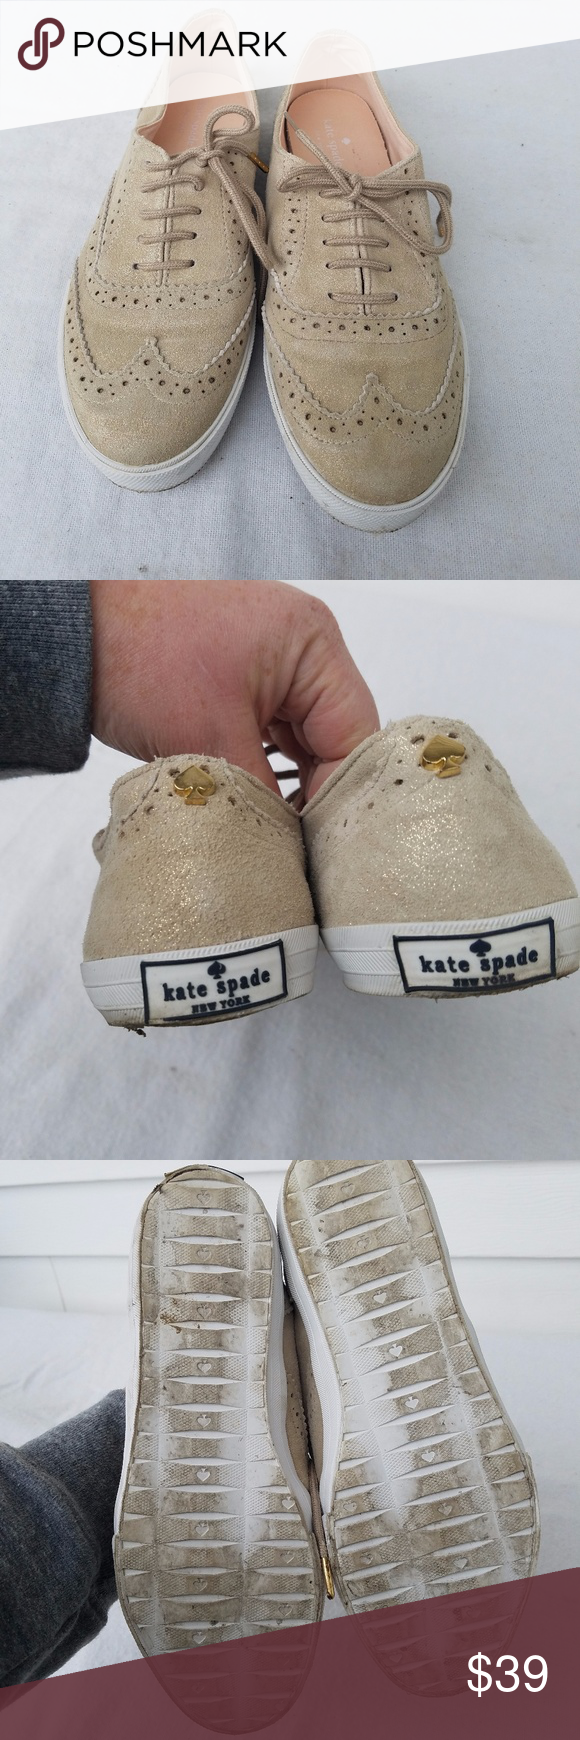 kate spade lima sneaker